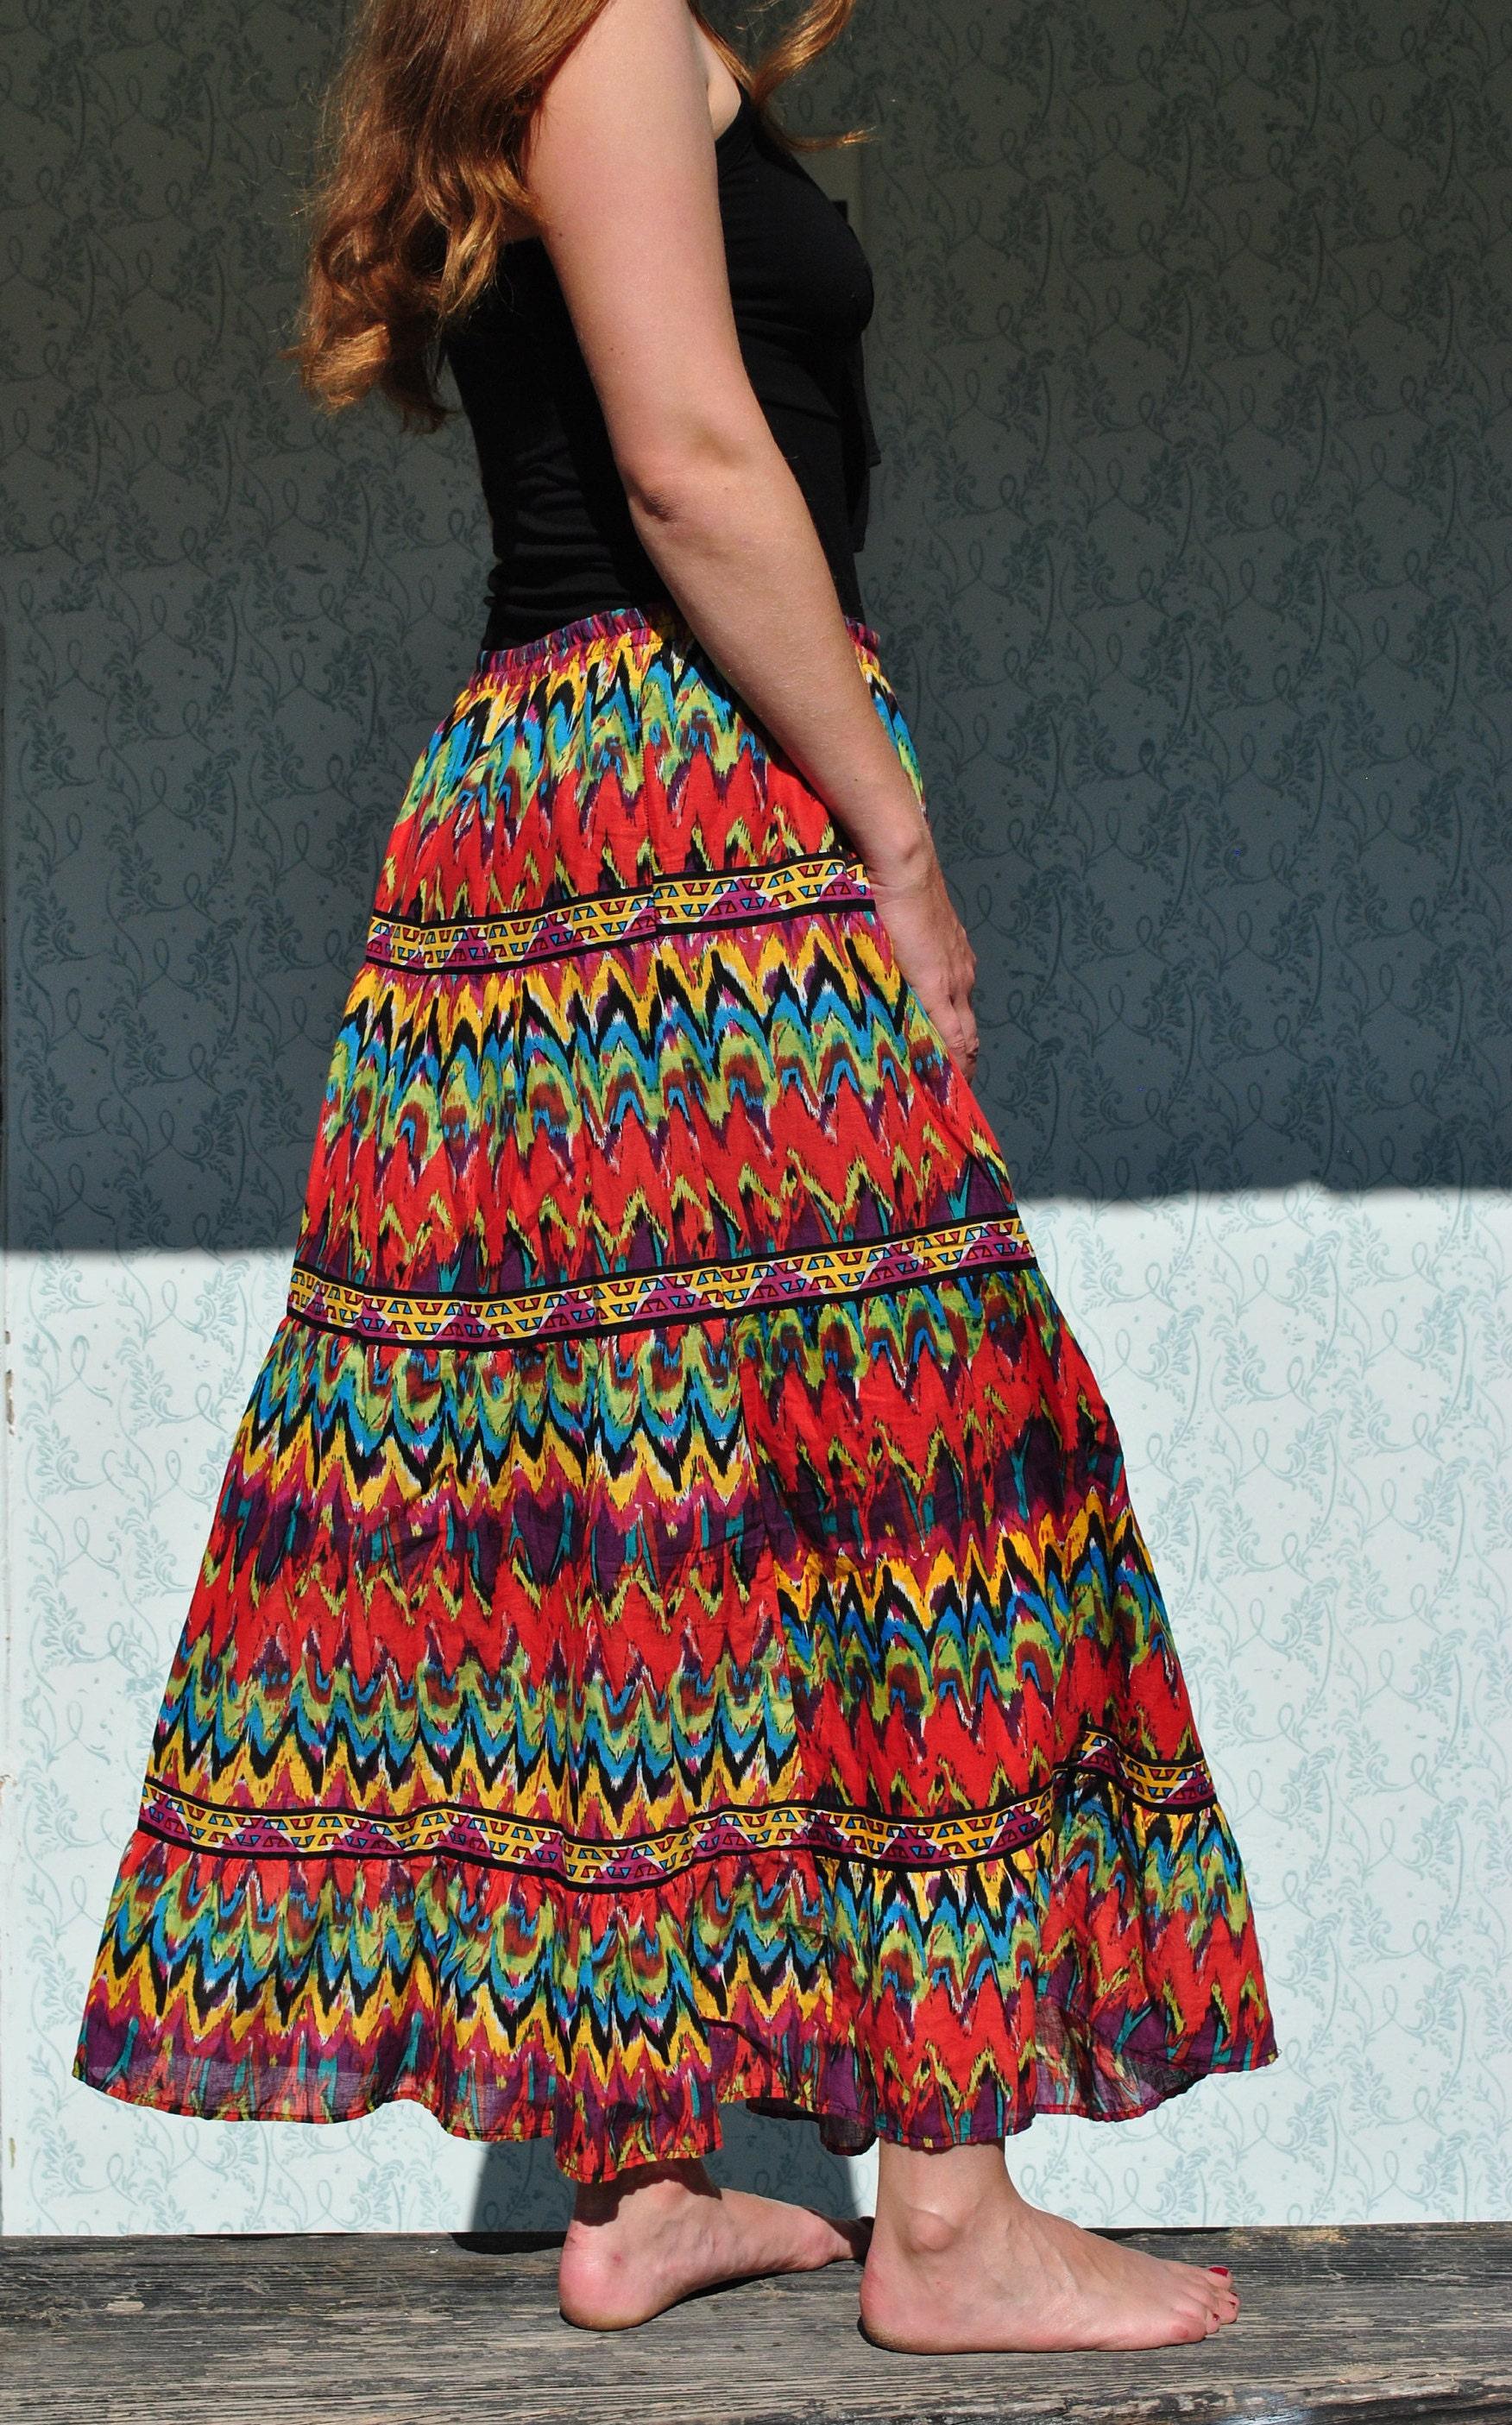 colorful maxi skirt large colorful skirt boho maxi skirt